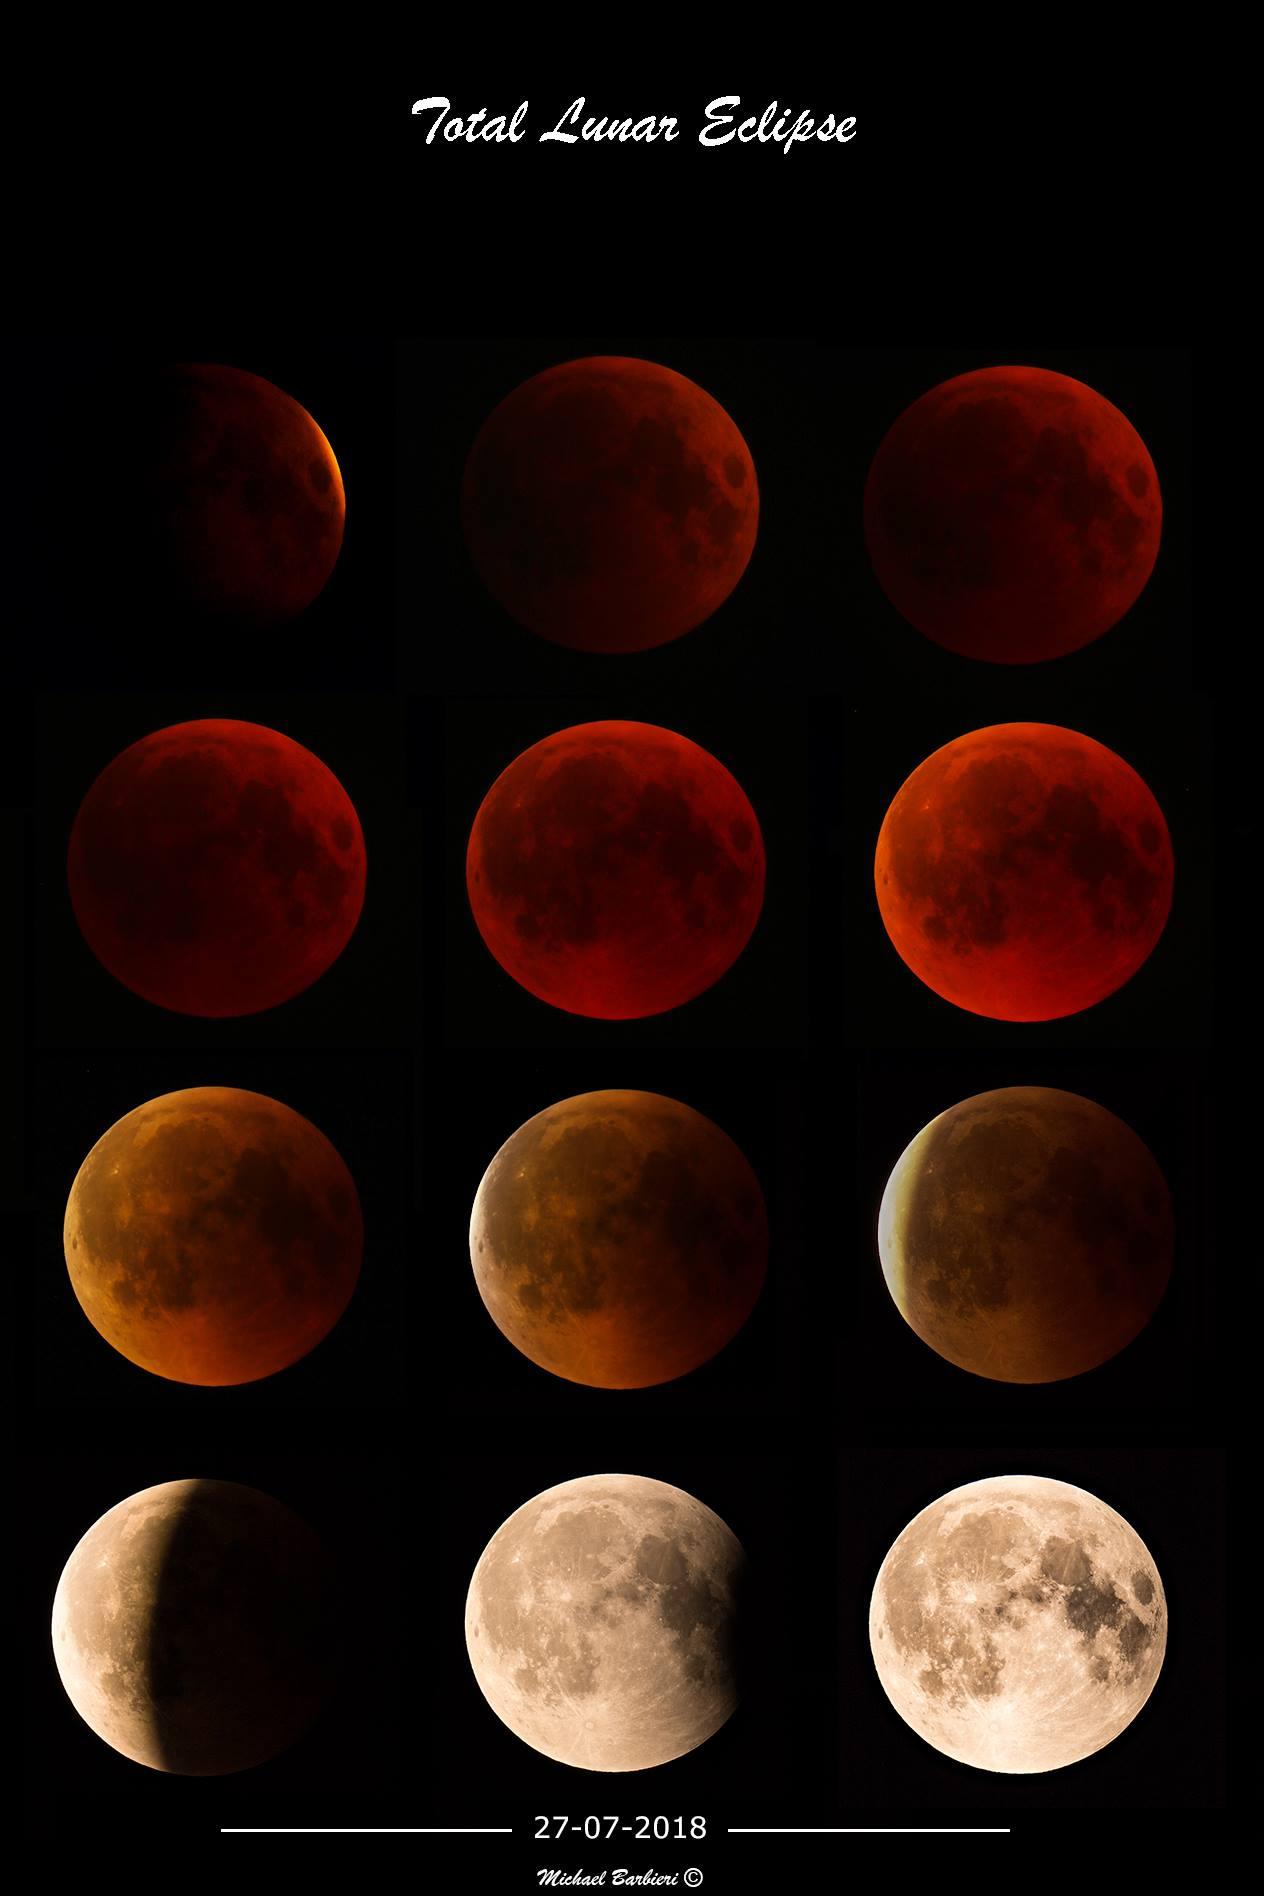 Eclissi di luna le spettacolari immagini riprese da Custoza VIDEO e FOTO